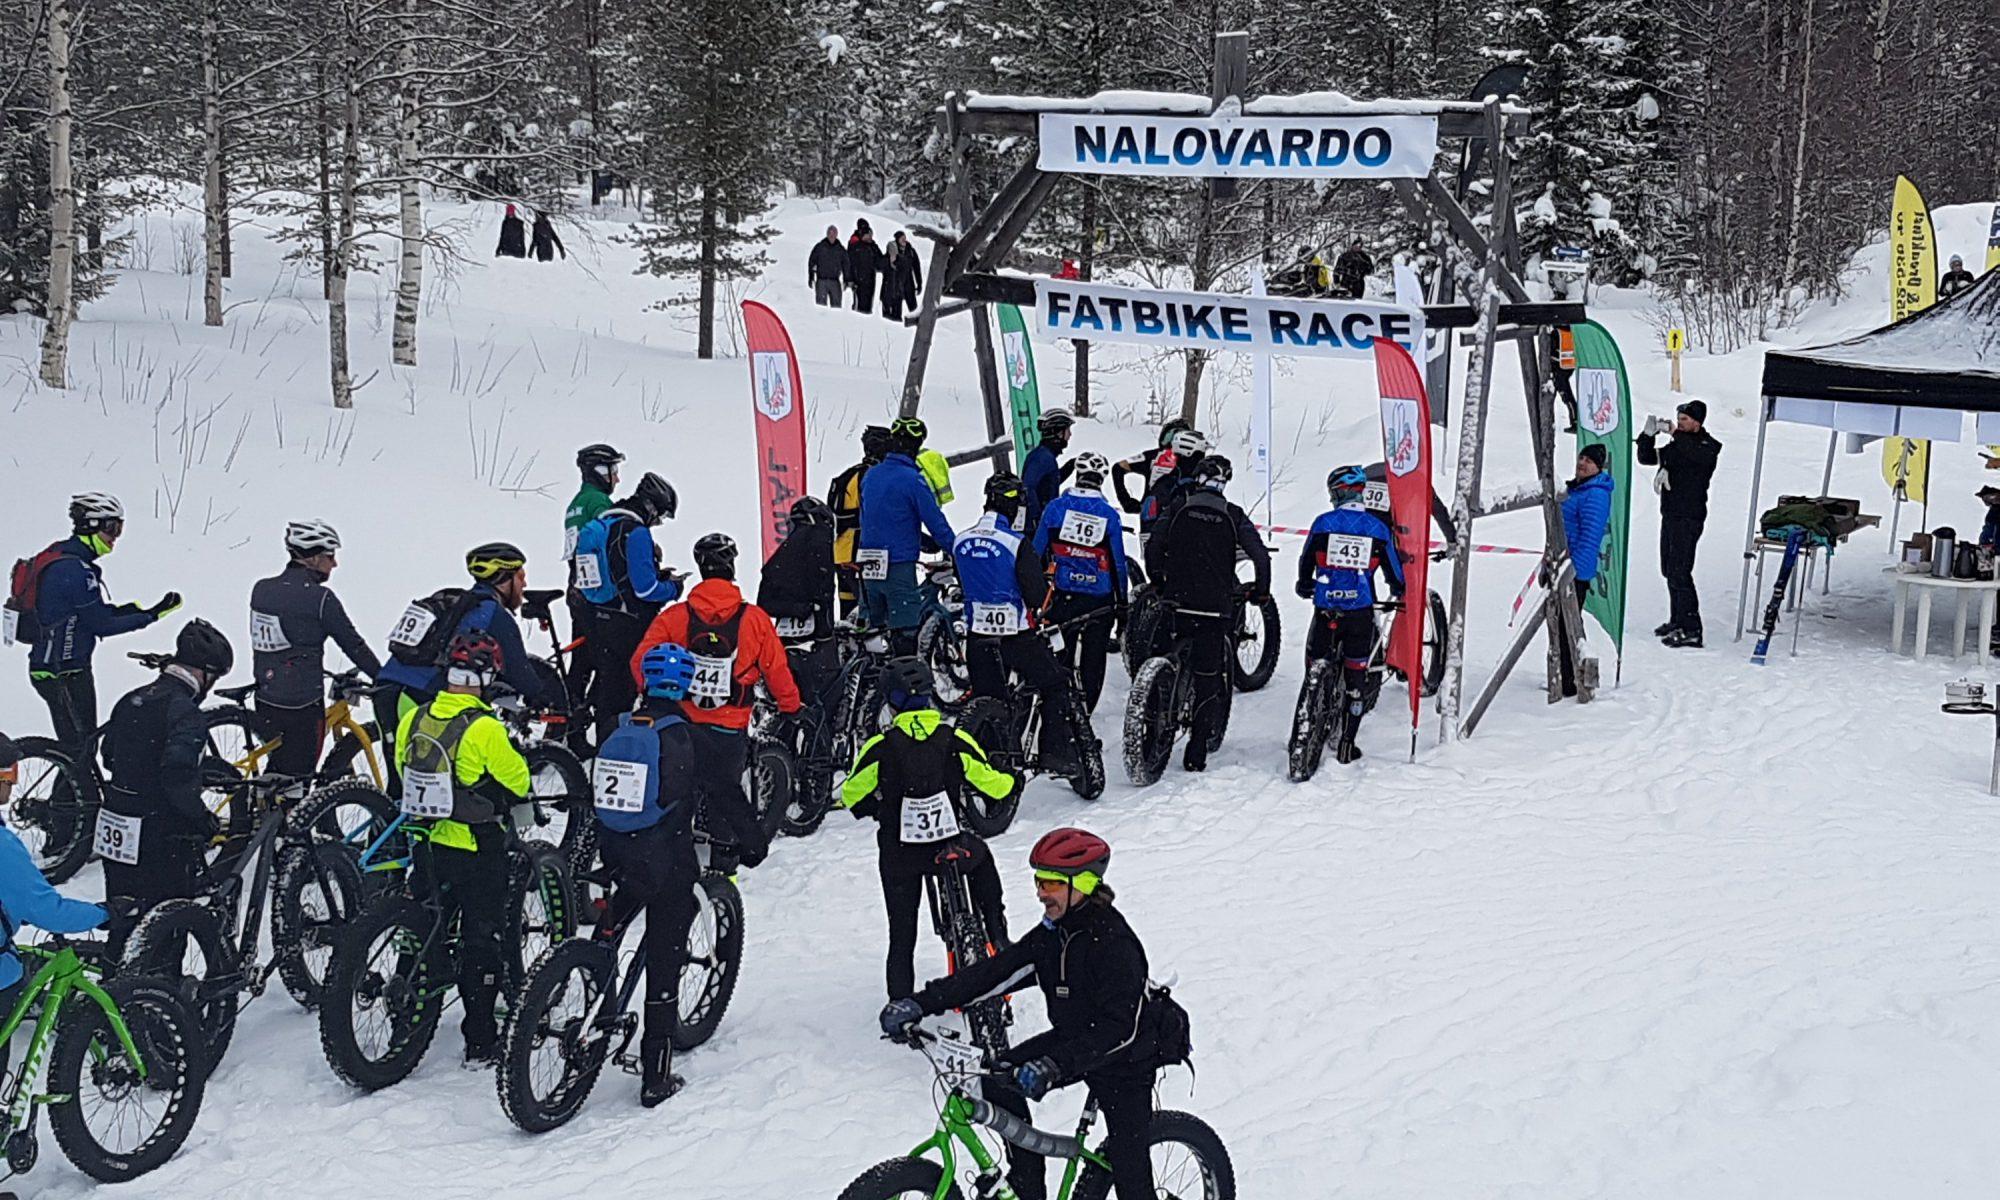 Nalovardo Fatbike Race 2018-03-10